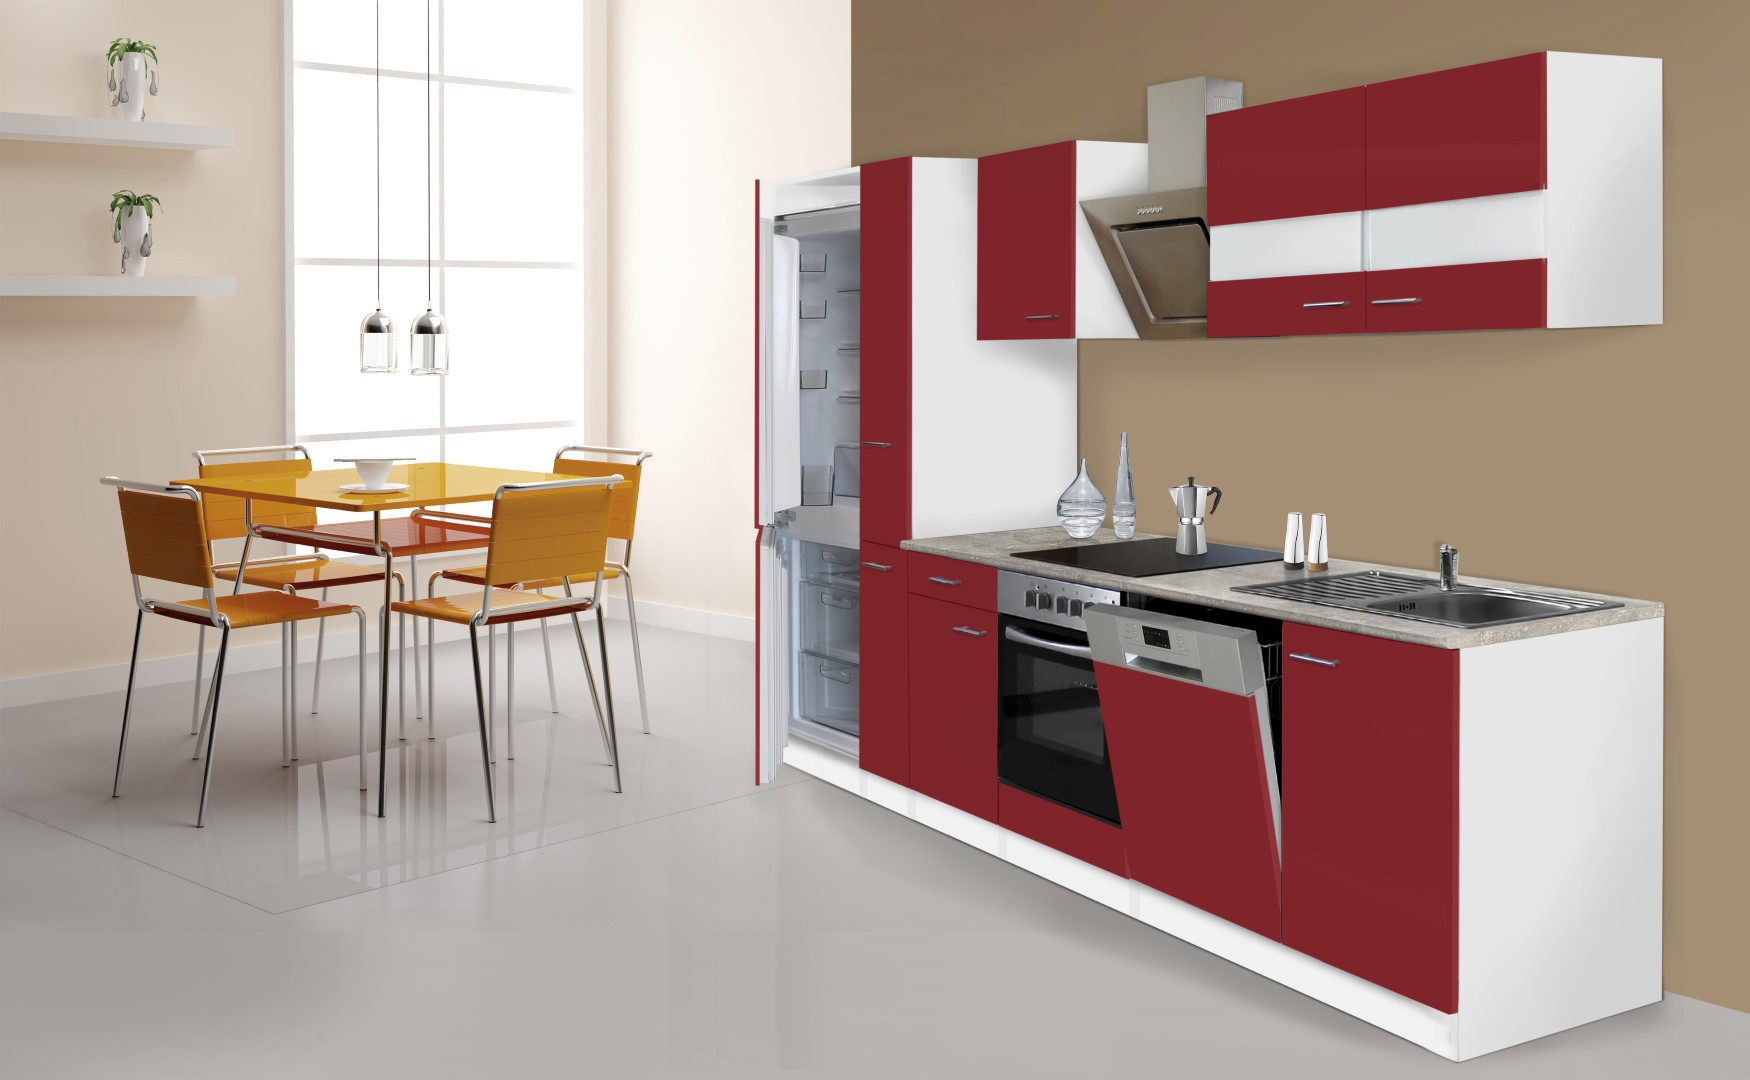 respekta k che k chenzeile k chenblock 310cm wei rot k hlkombi designhaube ebay. Black Bedroom Furniture Sets. Home Design Ideas